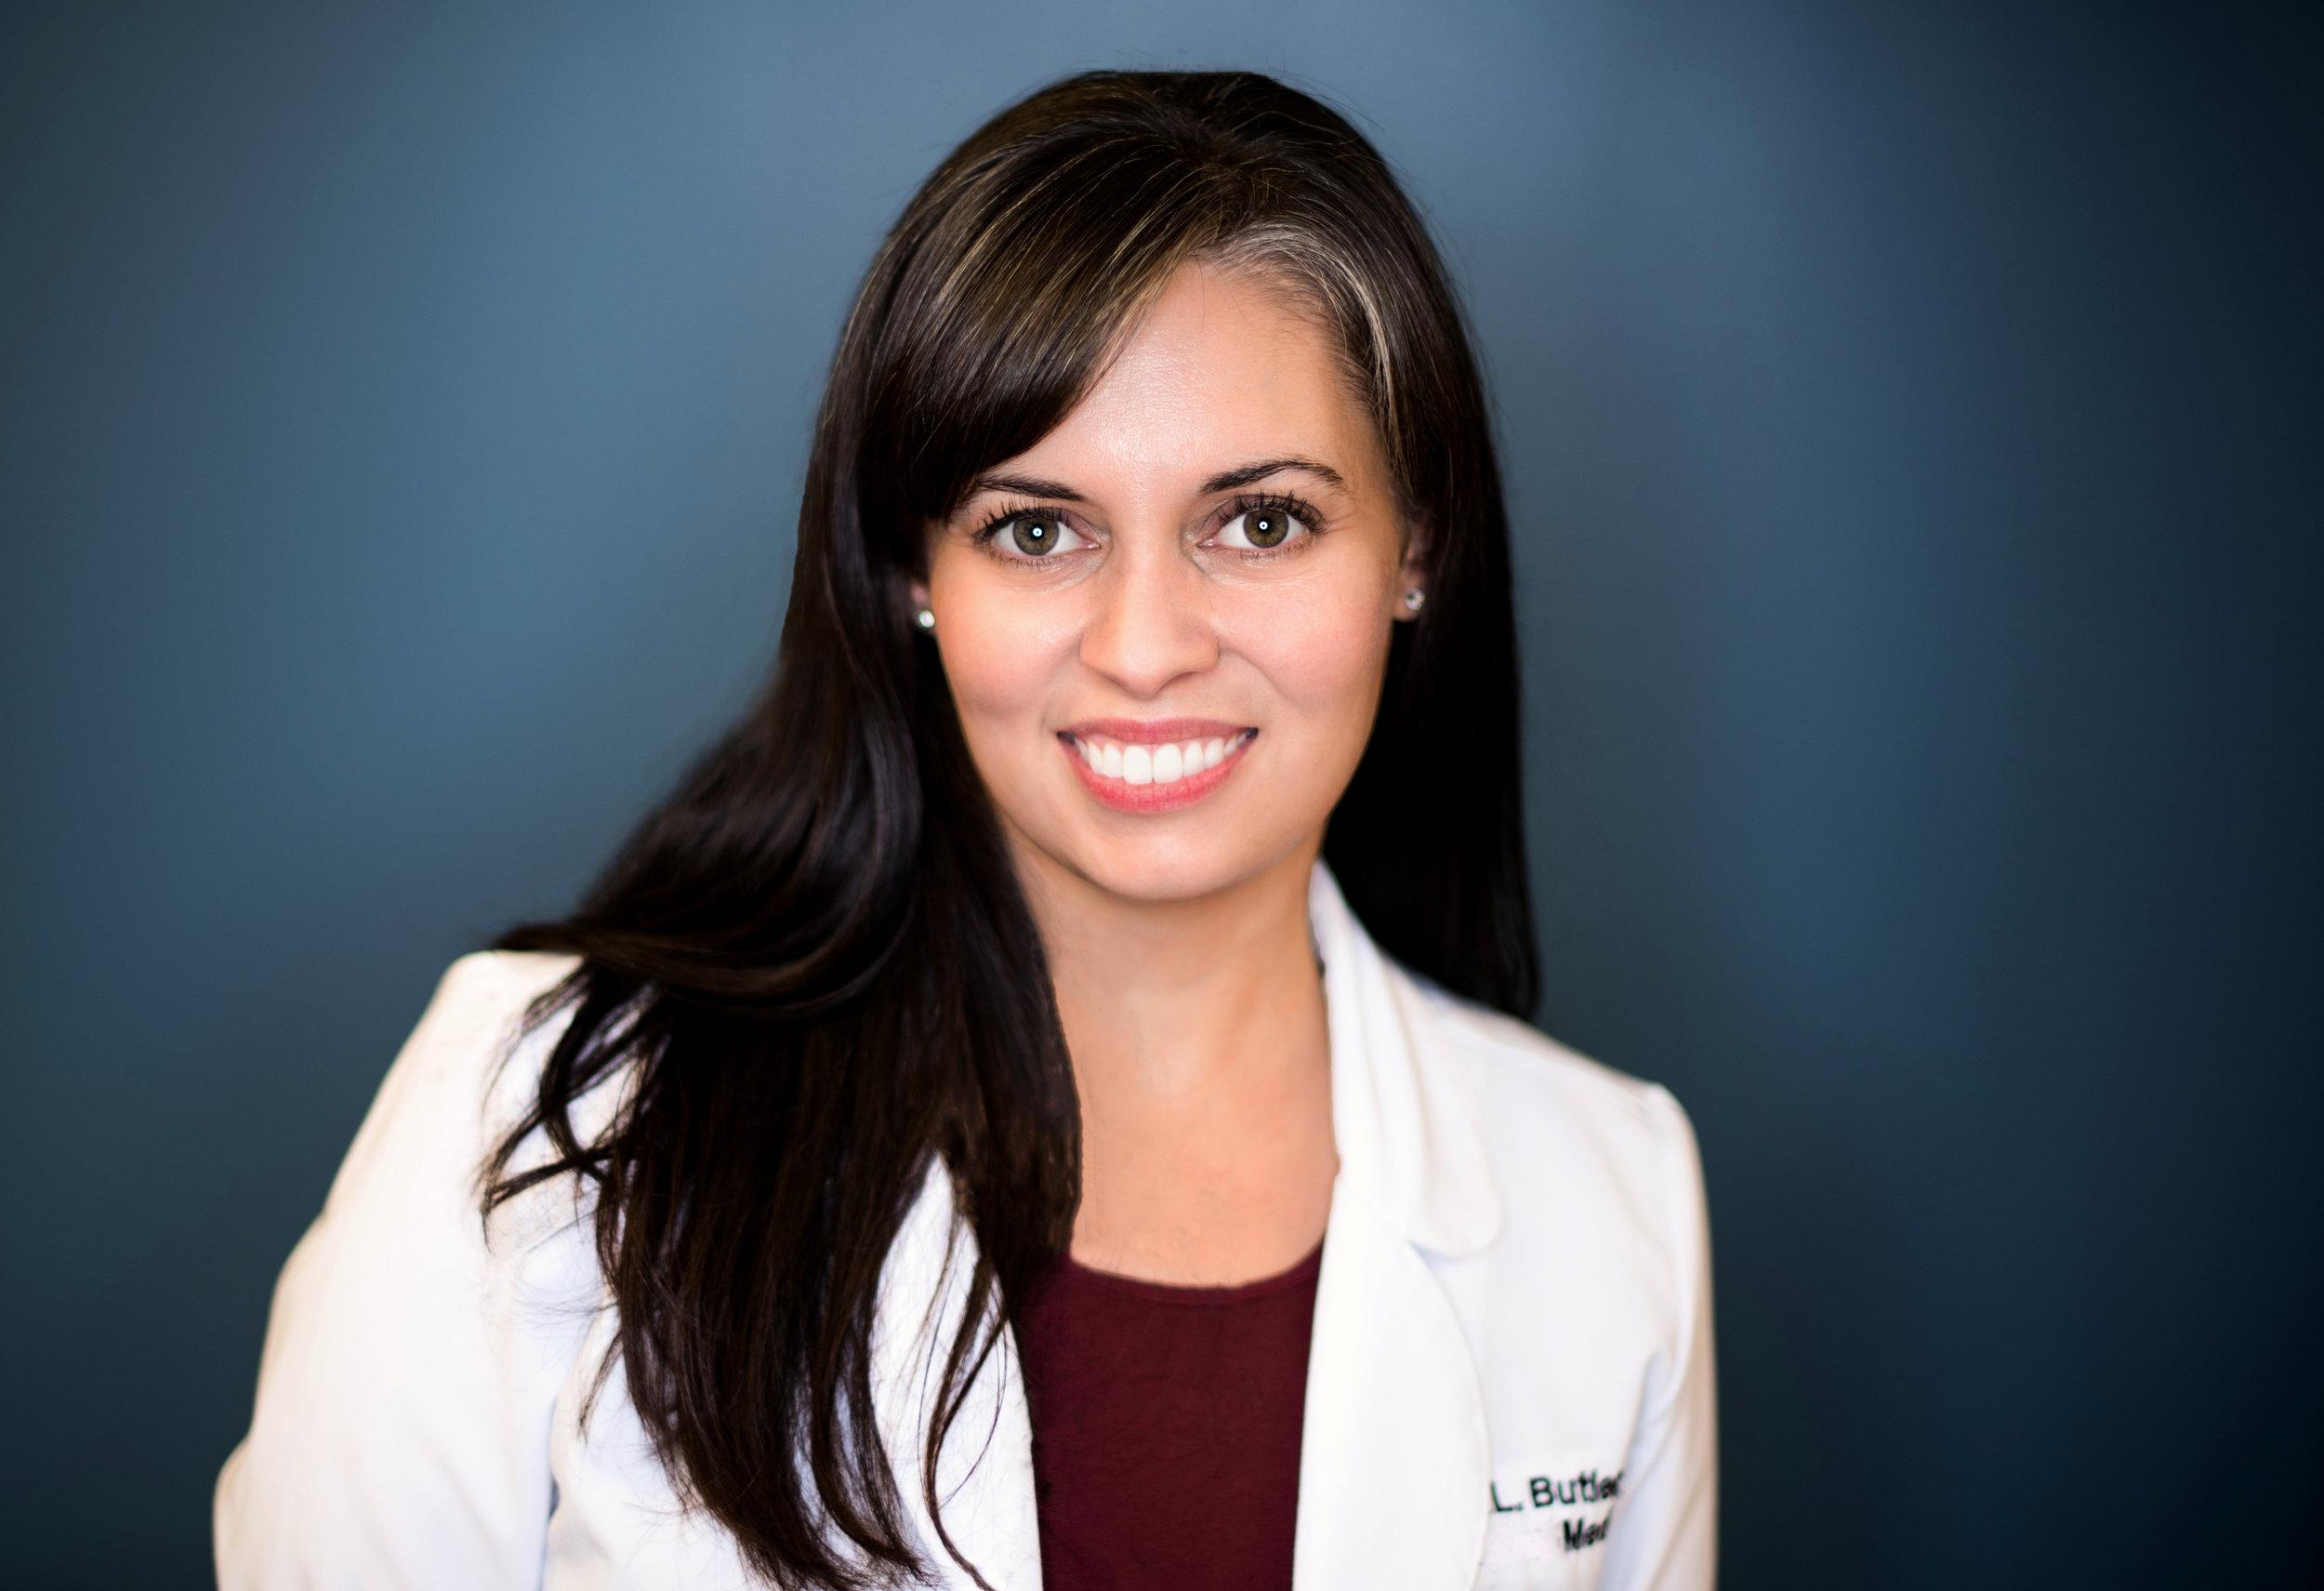 Dr. Isha Butler, D.O.